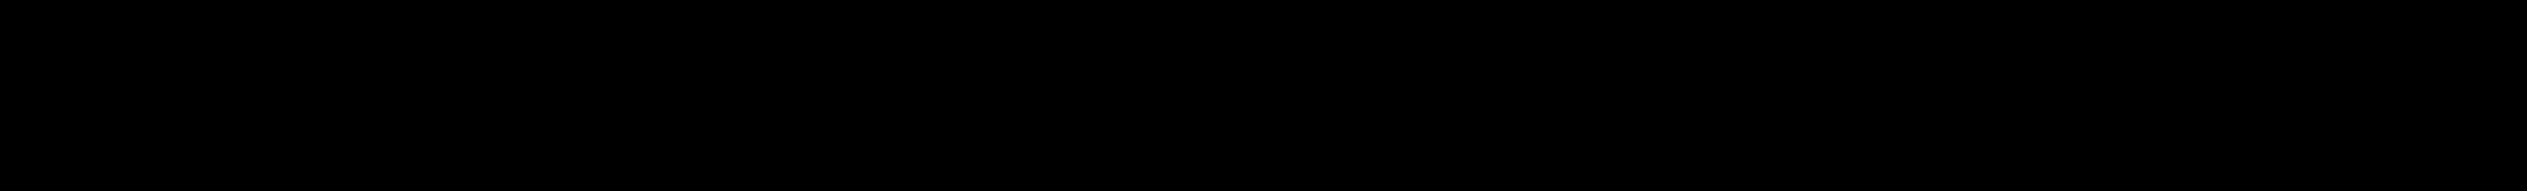 YWFT Formation Extra Light